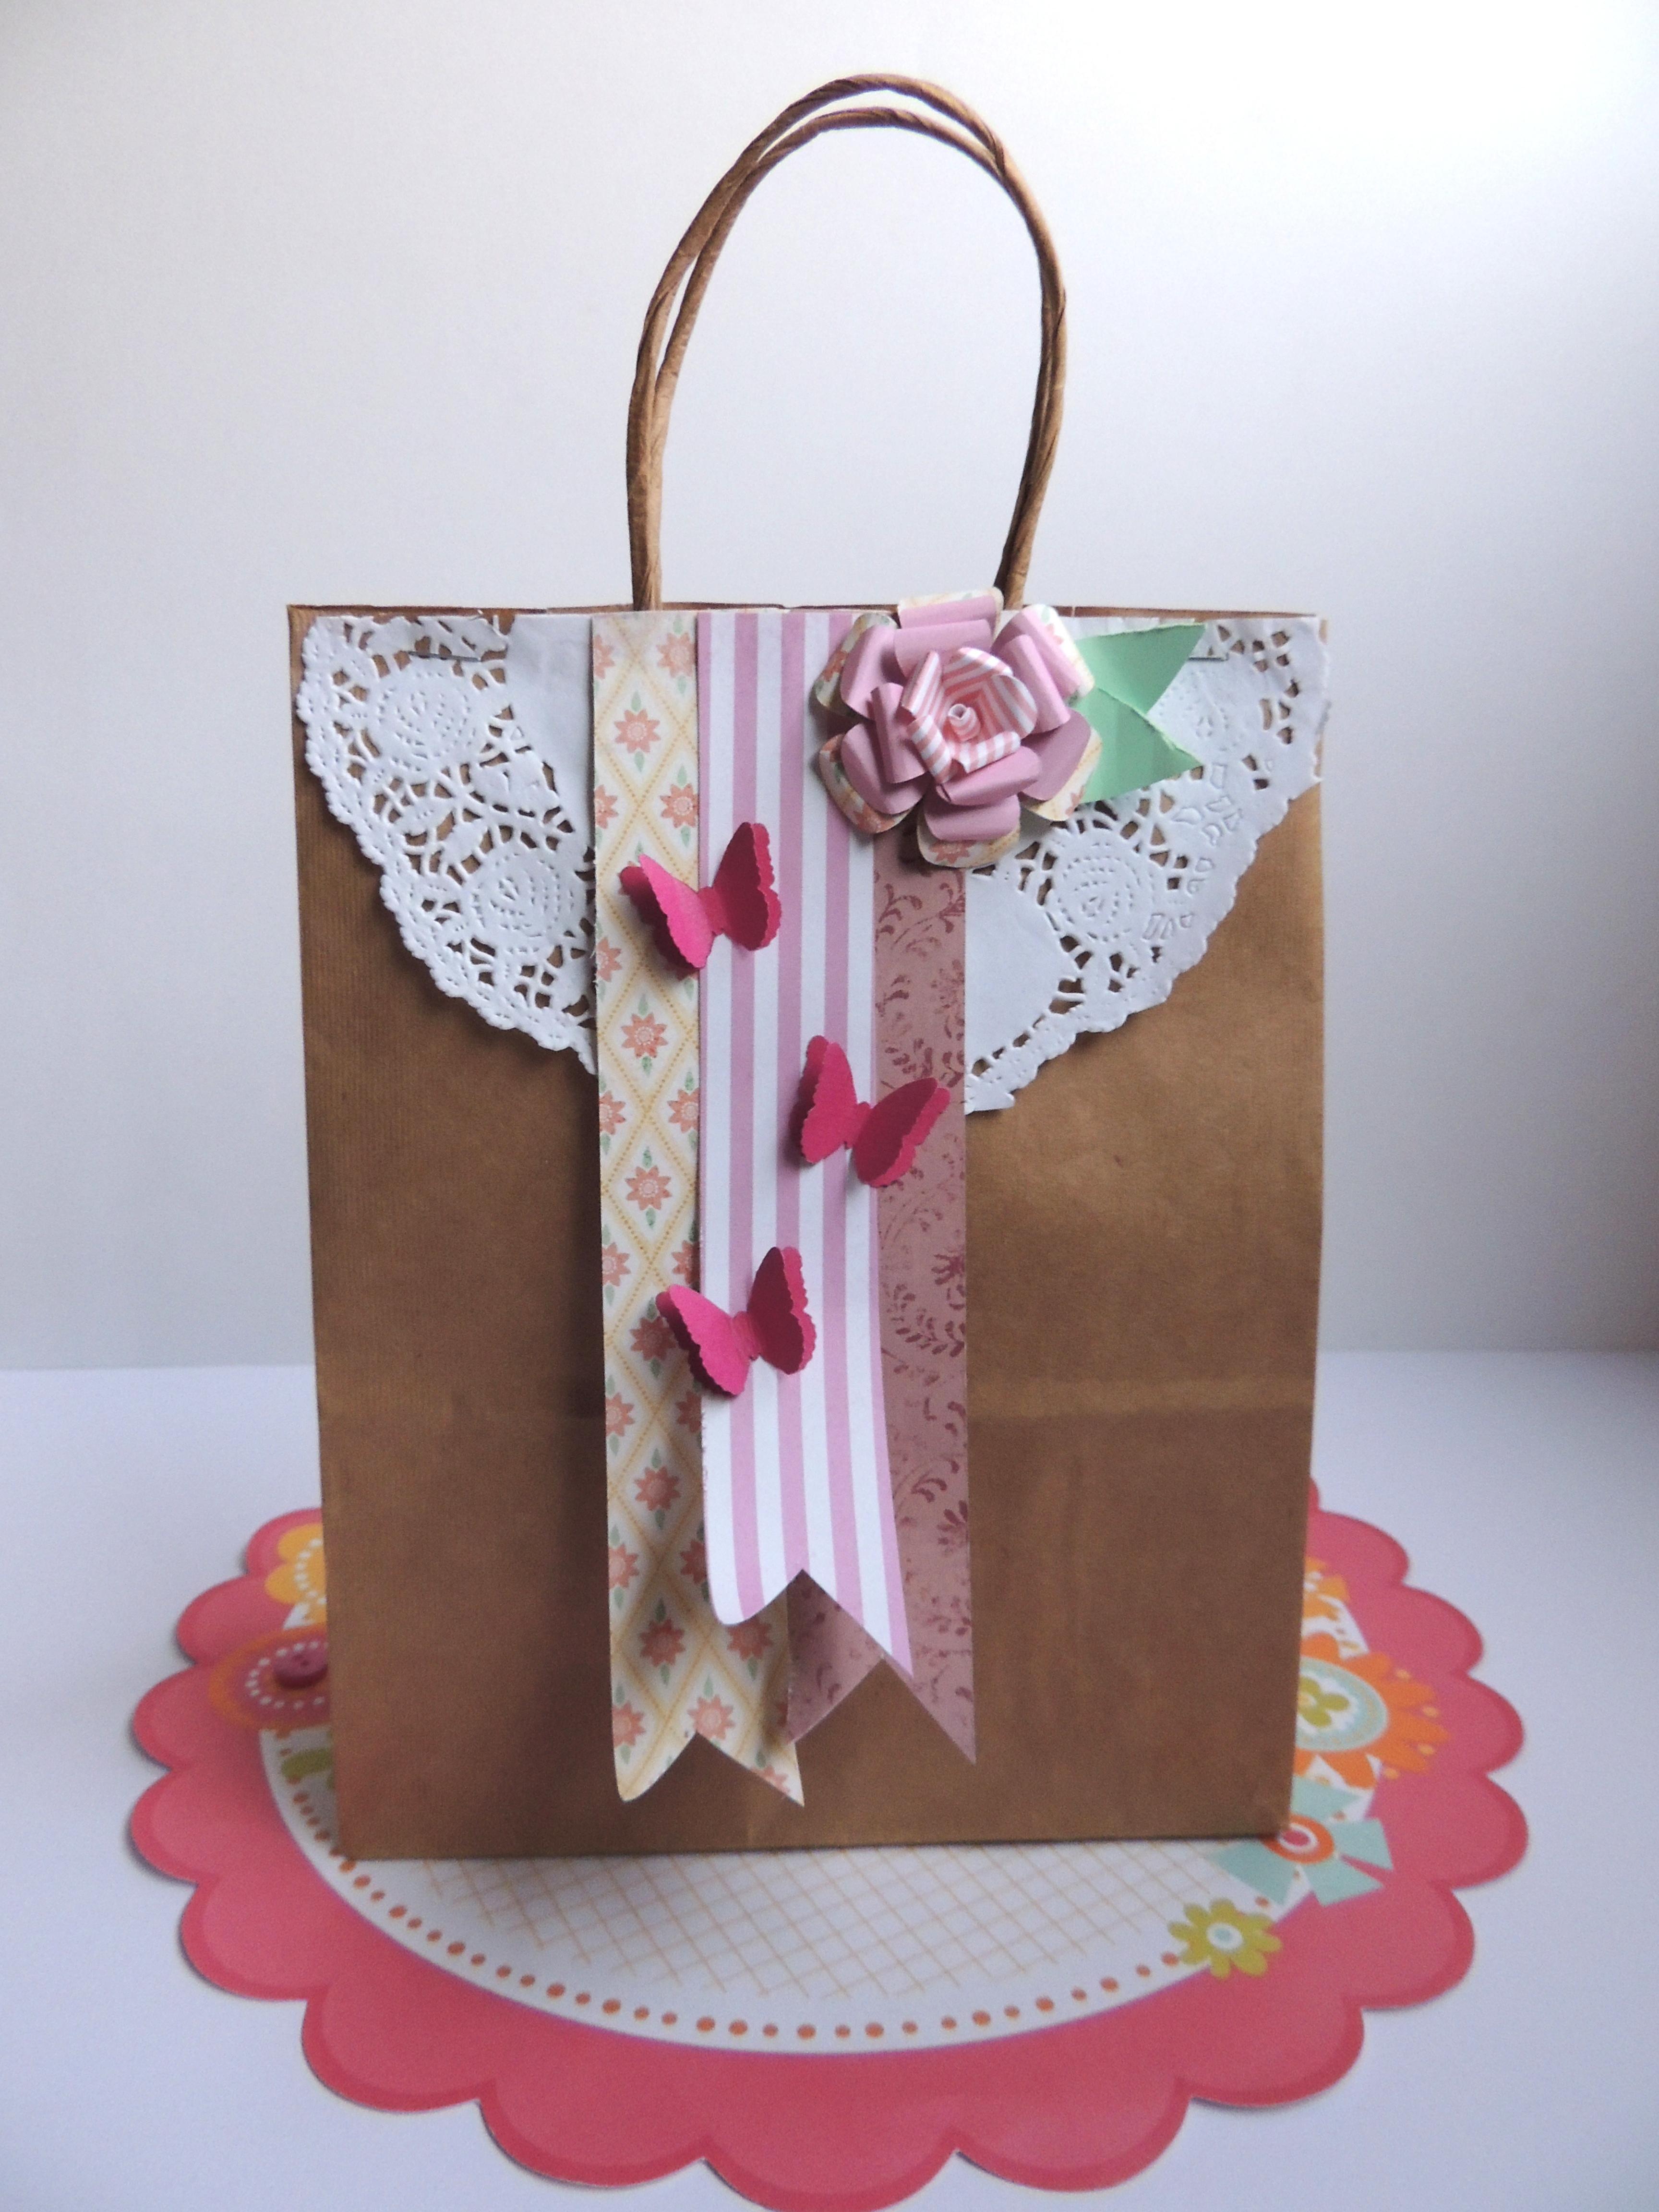 Bolsa De Papel Personalizada Casamento : Sacola craft decora??o de casamento ateli? cibele